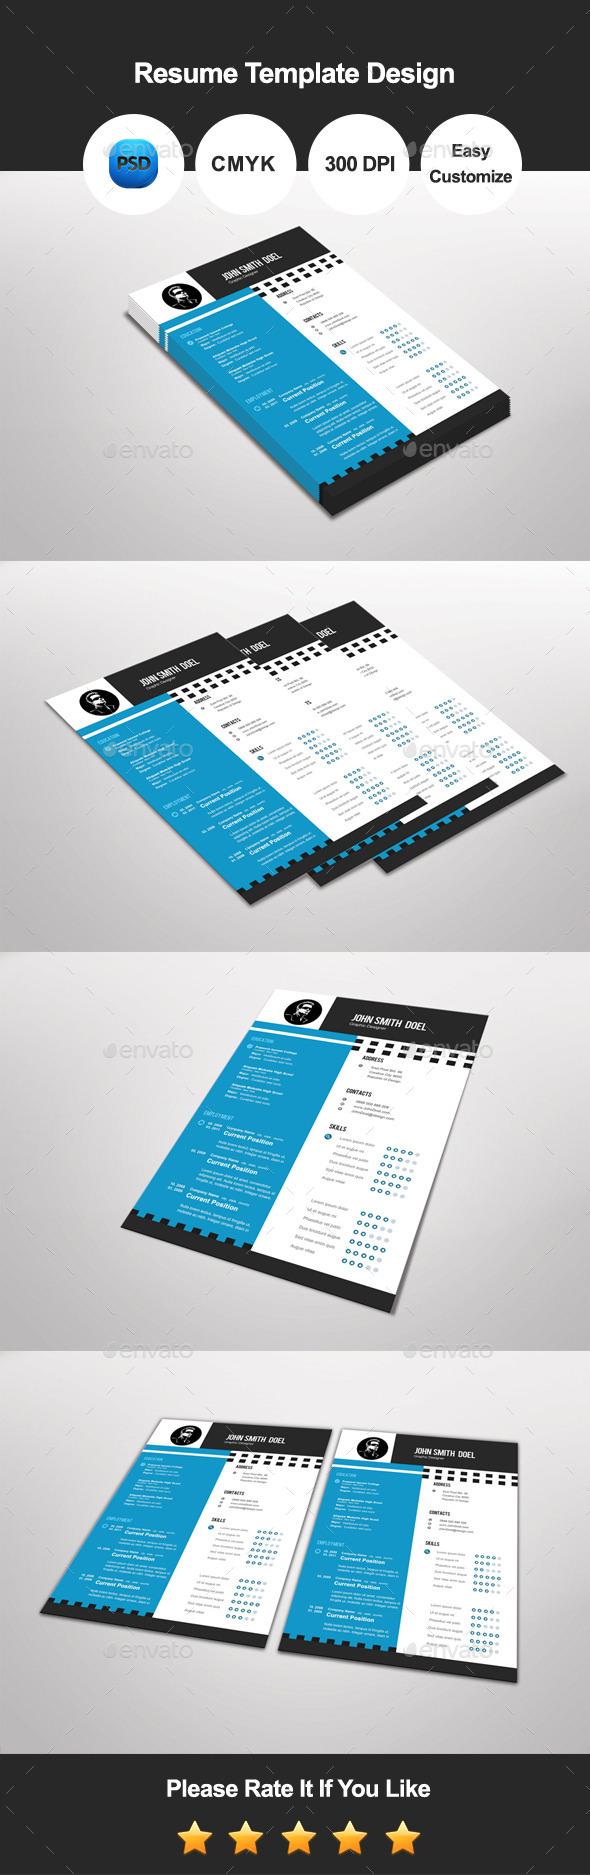 GraphicRiver Premium Resume Template Design 11279953